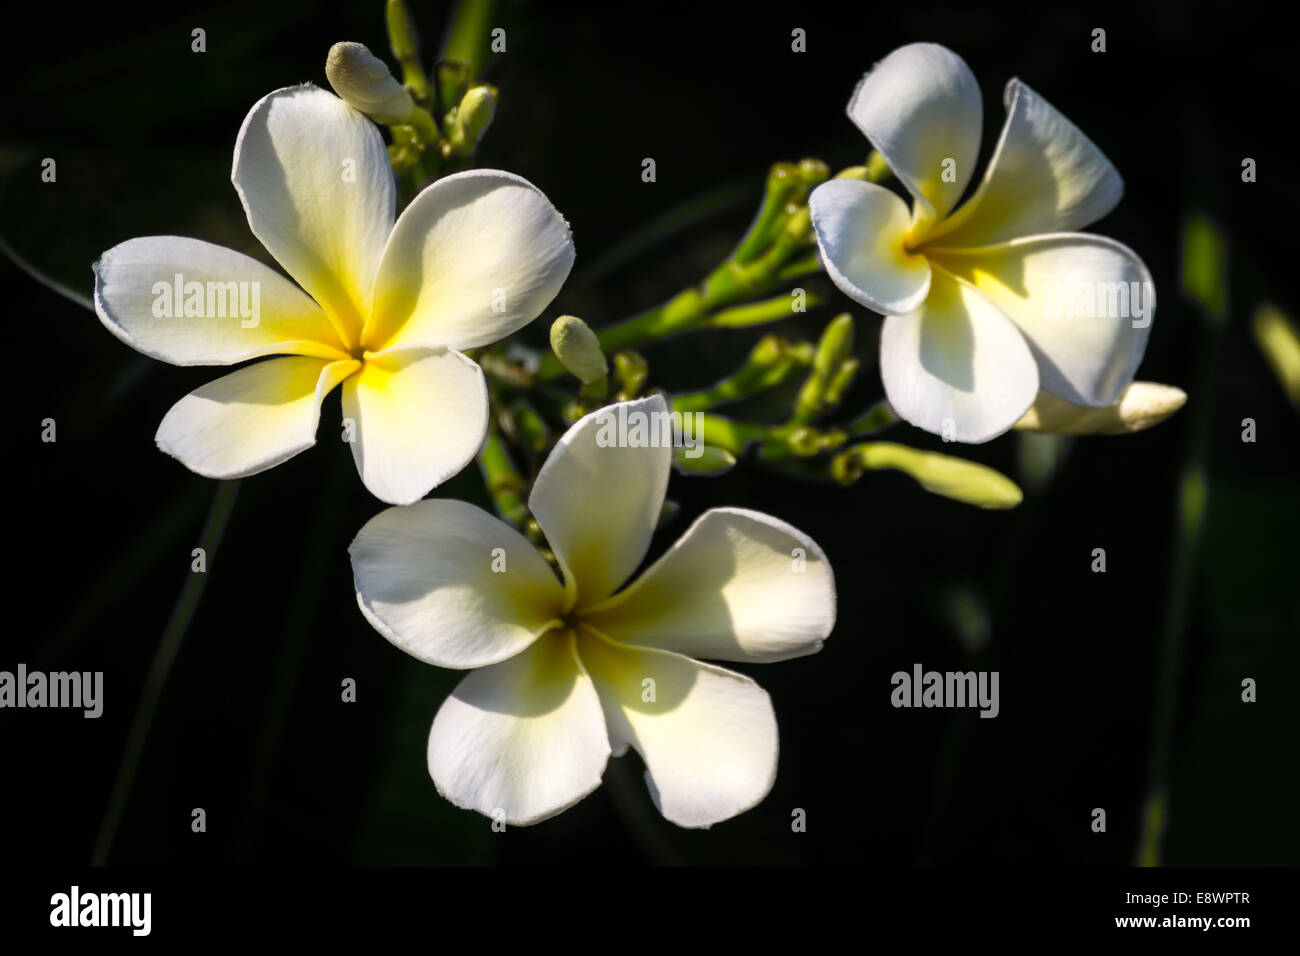 Three White Plumeria Tree Flowers Closeup Hawaii Black Background